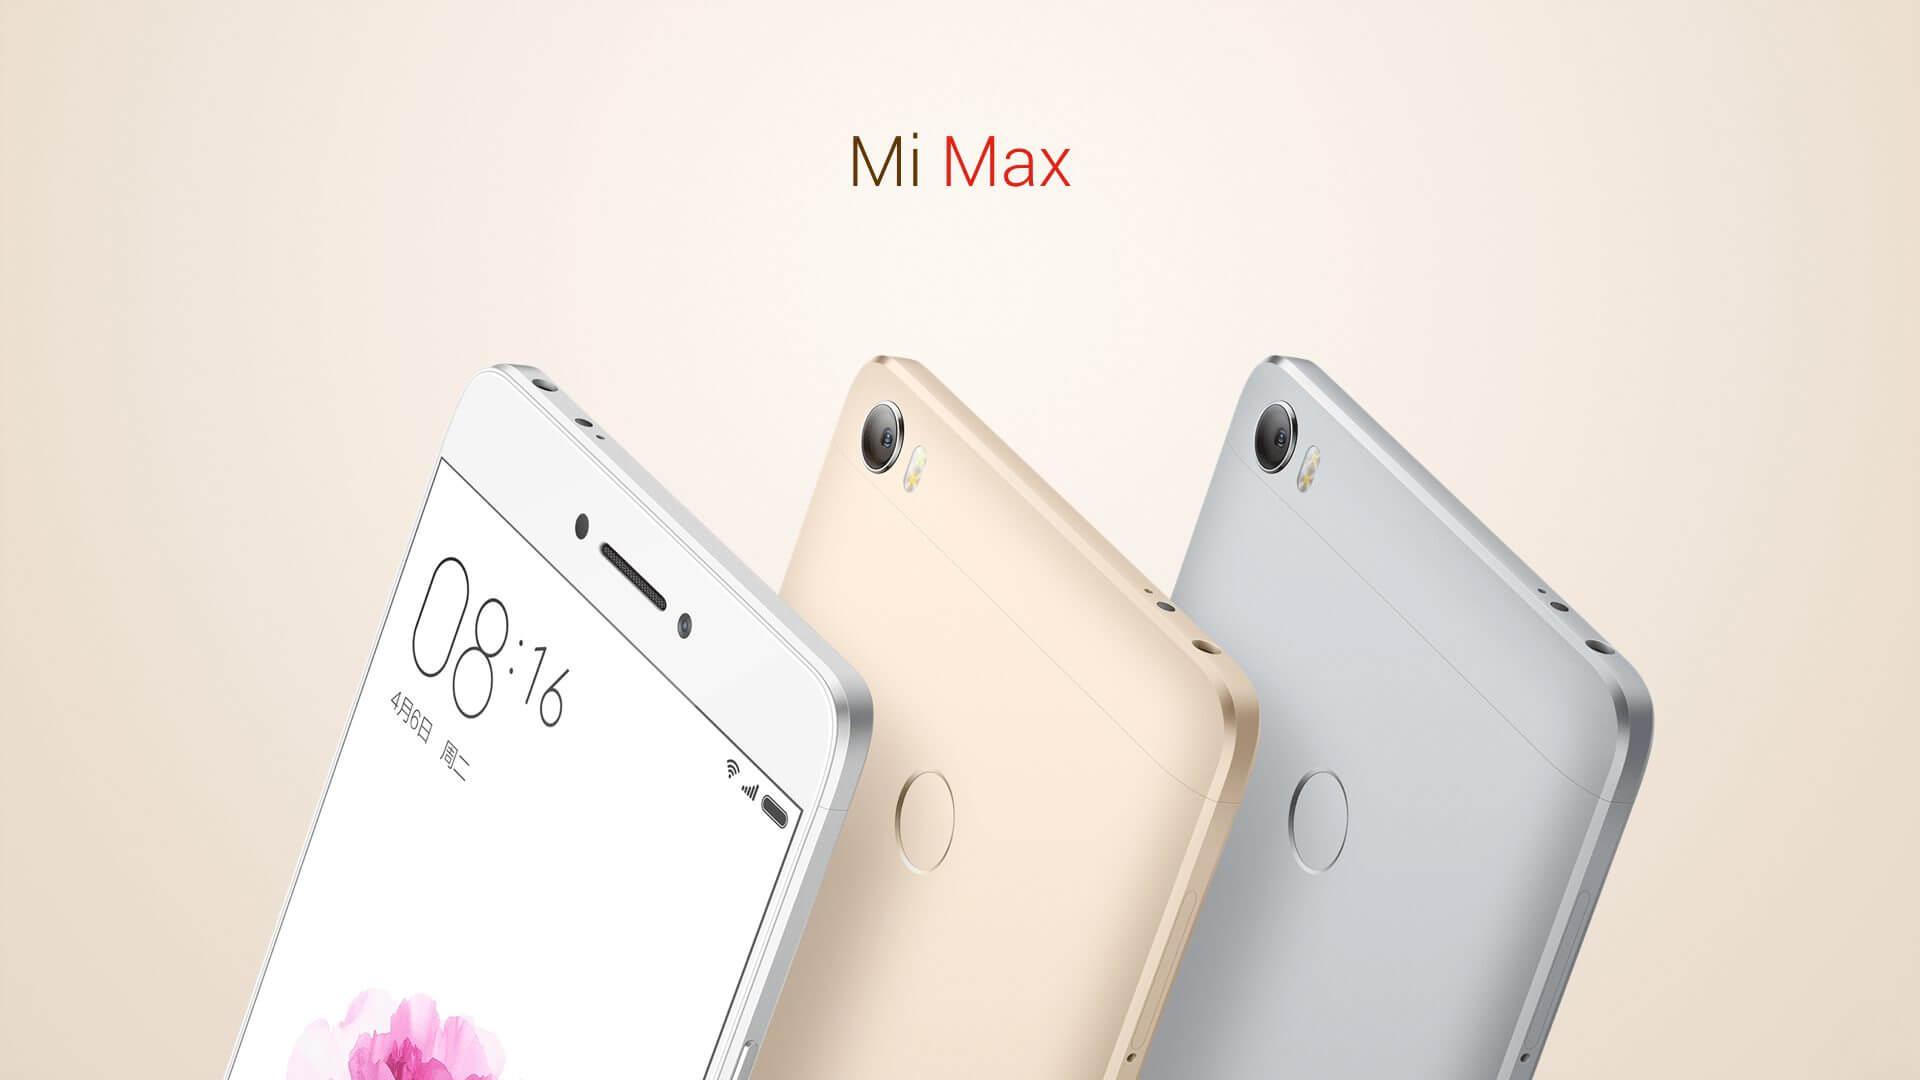 smt xiaomi gal01 - Xiaomi anuncia o Mi Max e revela o MIUI 8